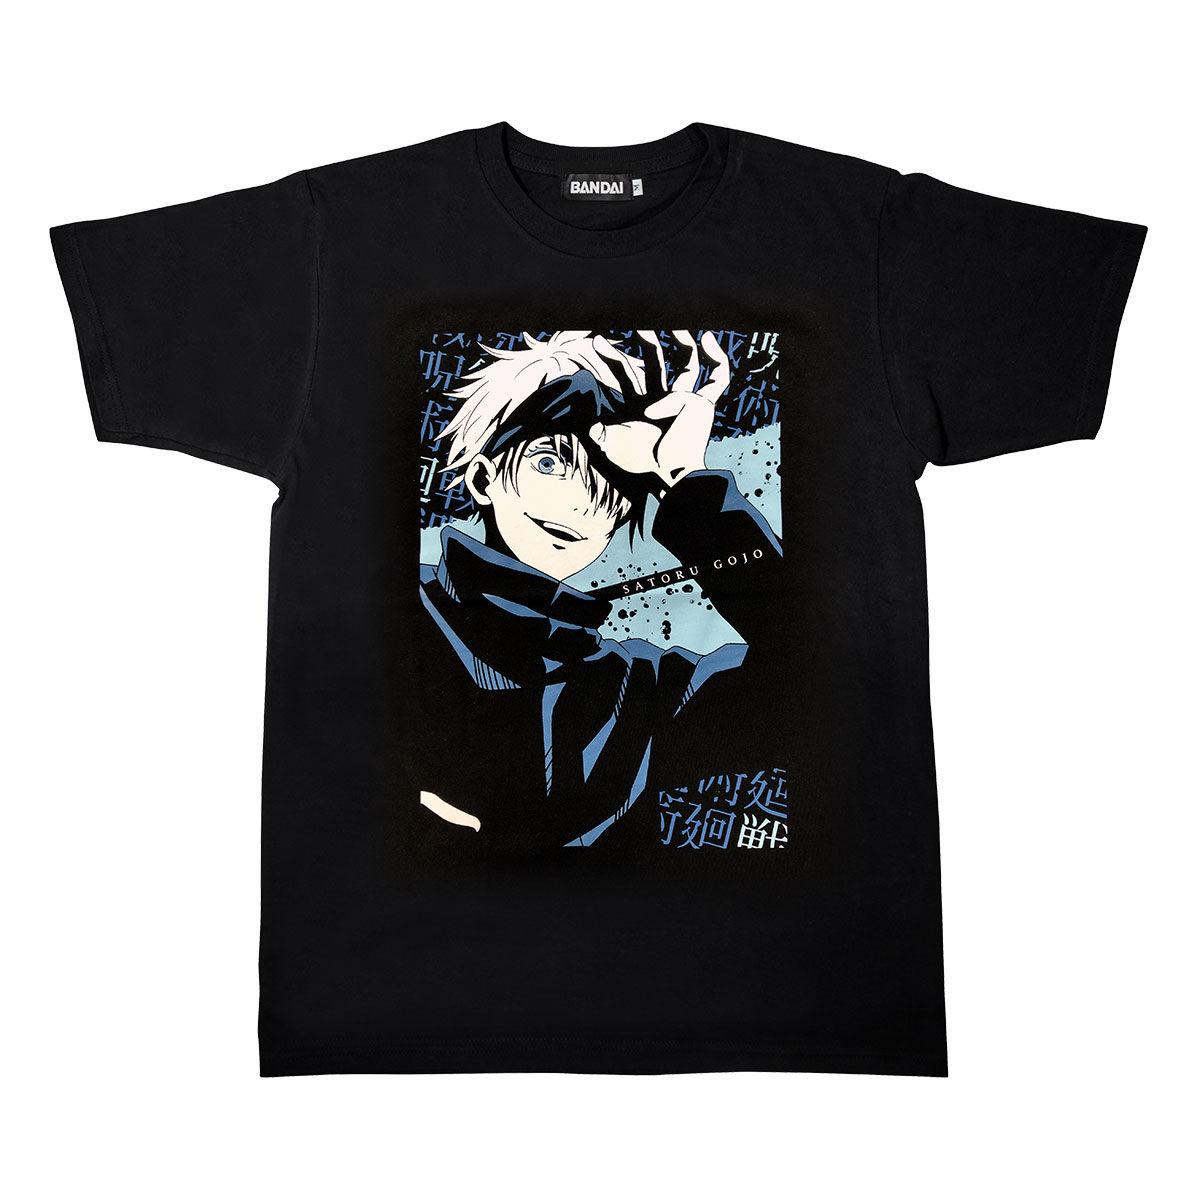 Jujutsu Kaisen T-shirt Collection IV